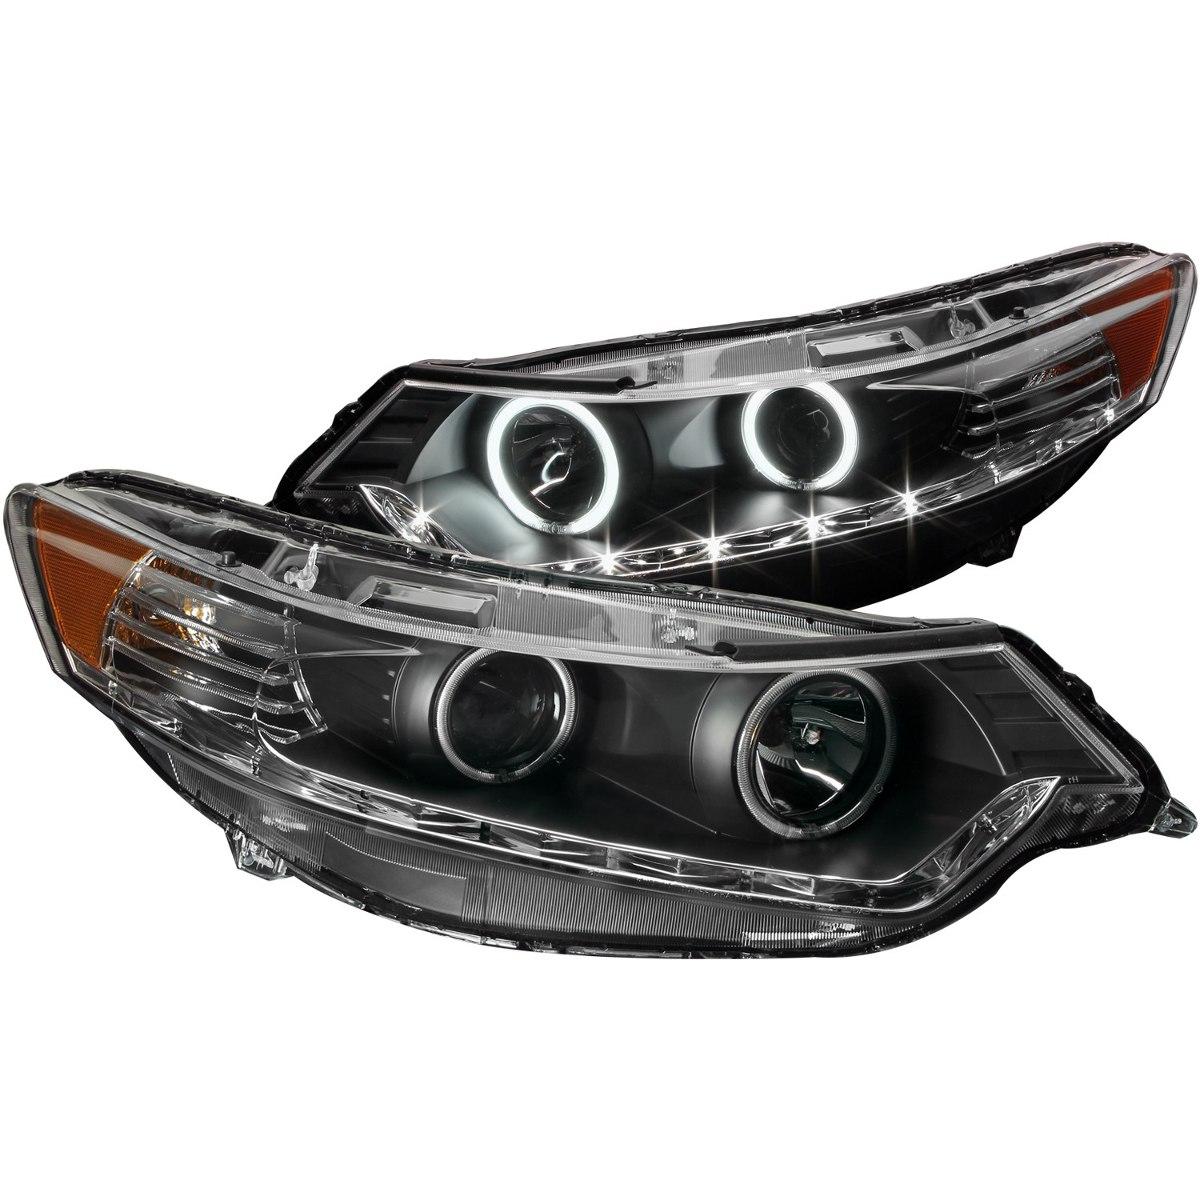 Acura Tsx 09-10 Projector Halo Black(ccfl)hid